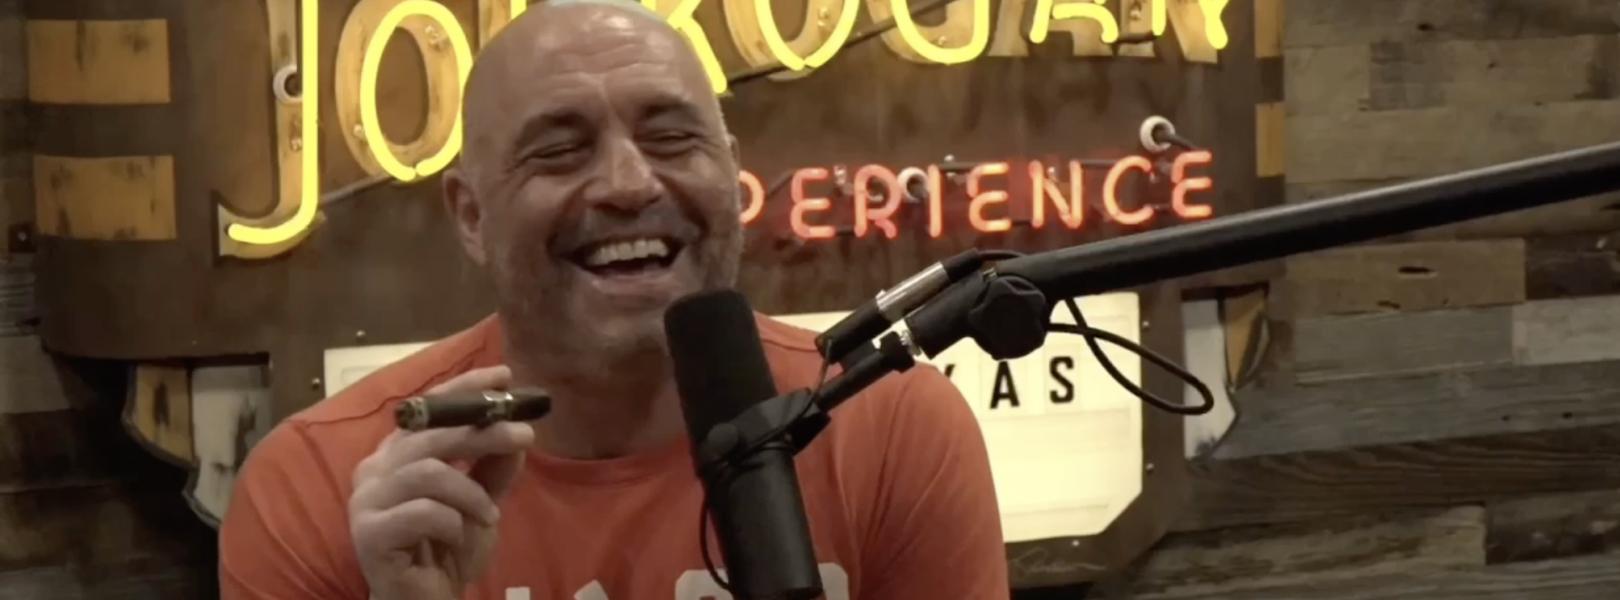 Joe Rogan in an orange shirt